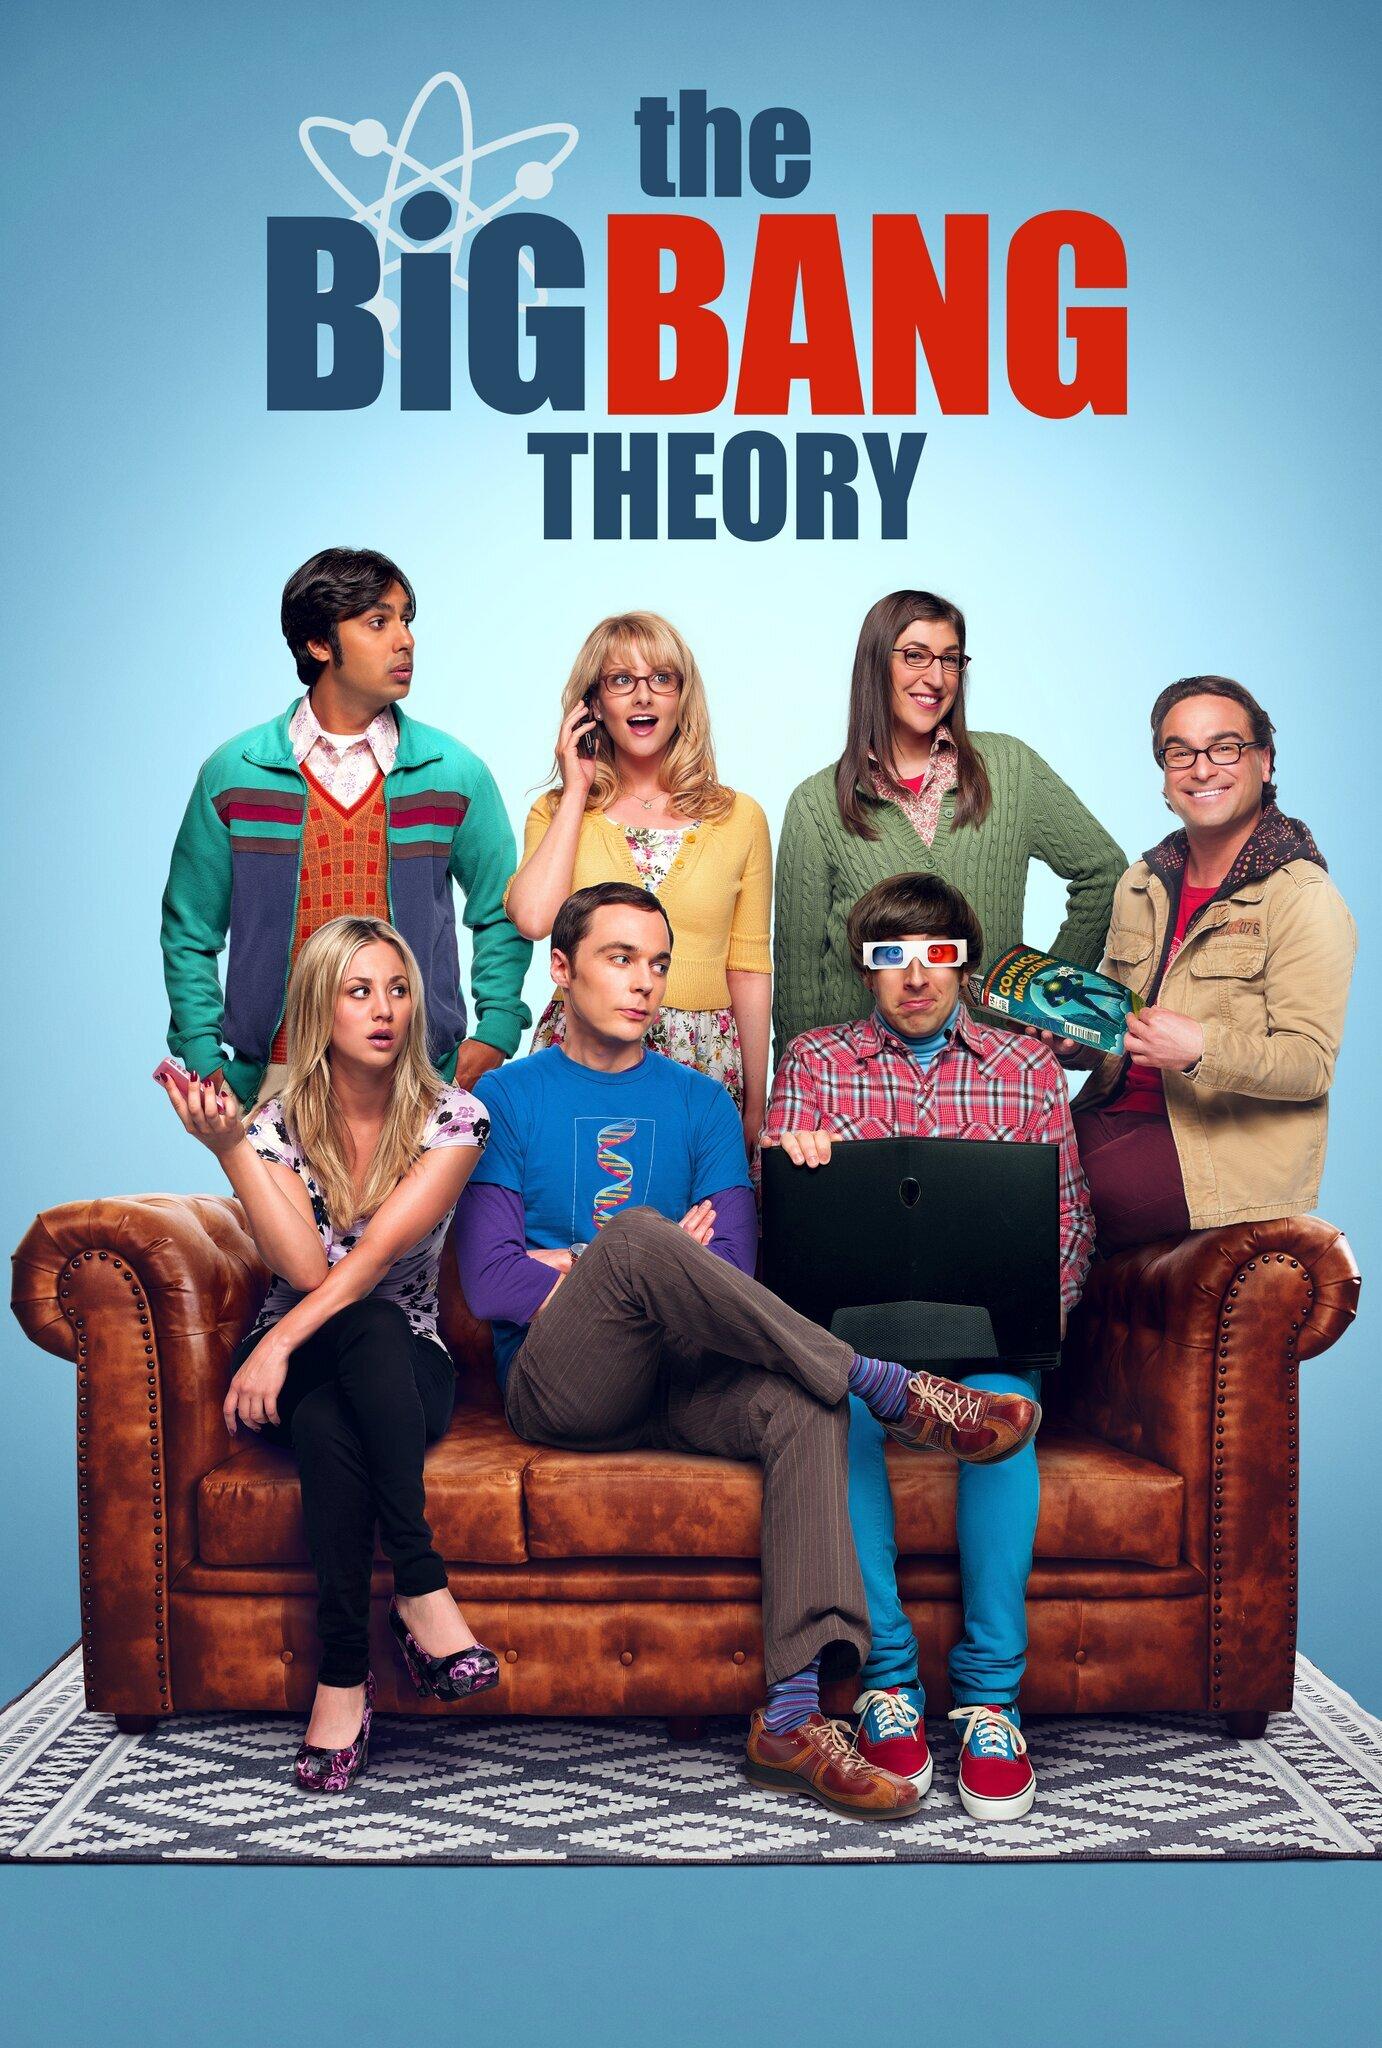 Watch The Big Bang Theory Online | Season 12 (2018) | TV Guide